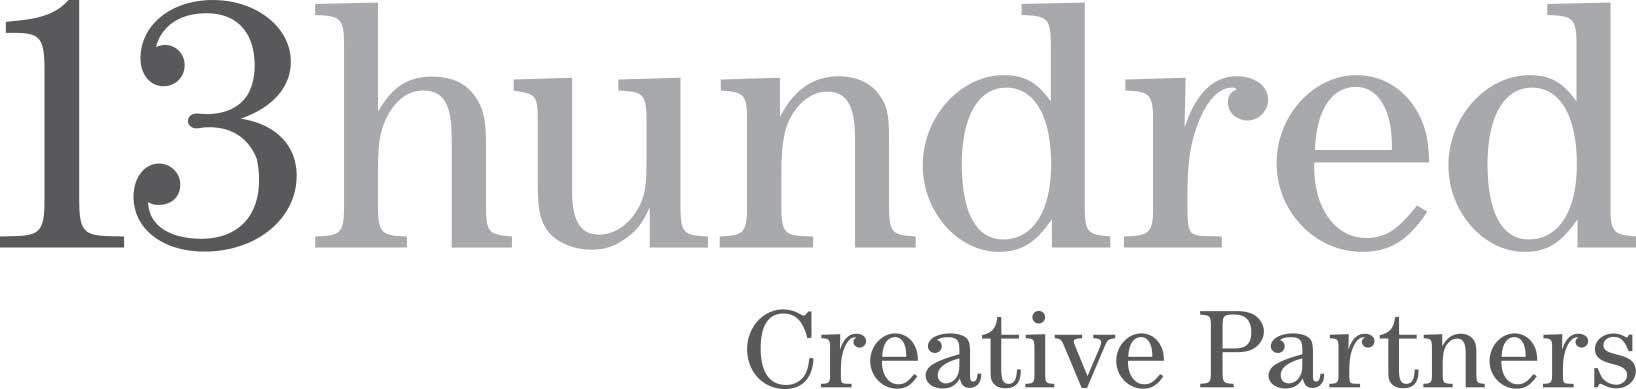 13hundred-Creative-Partners-Logo.jpg